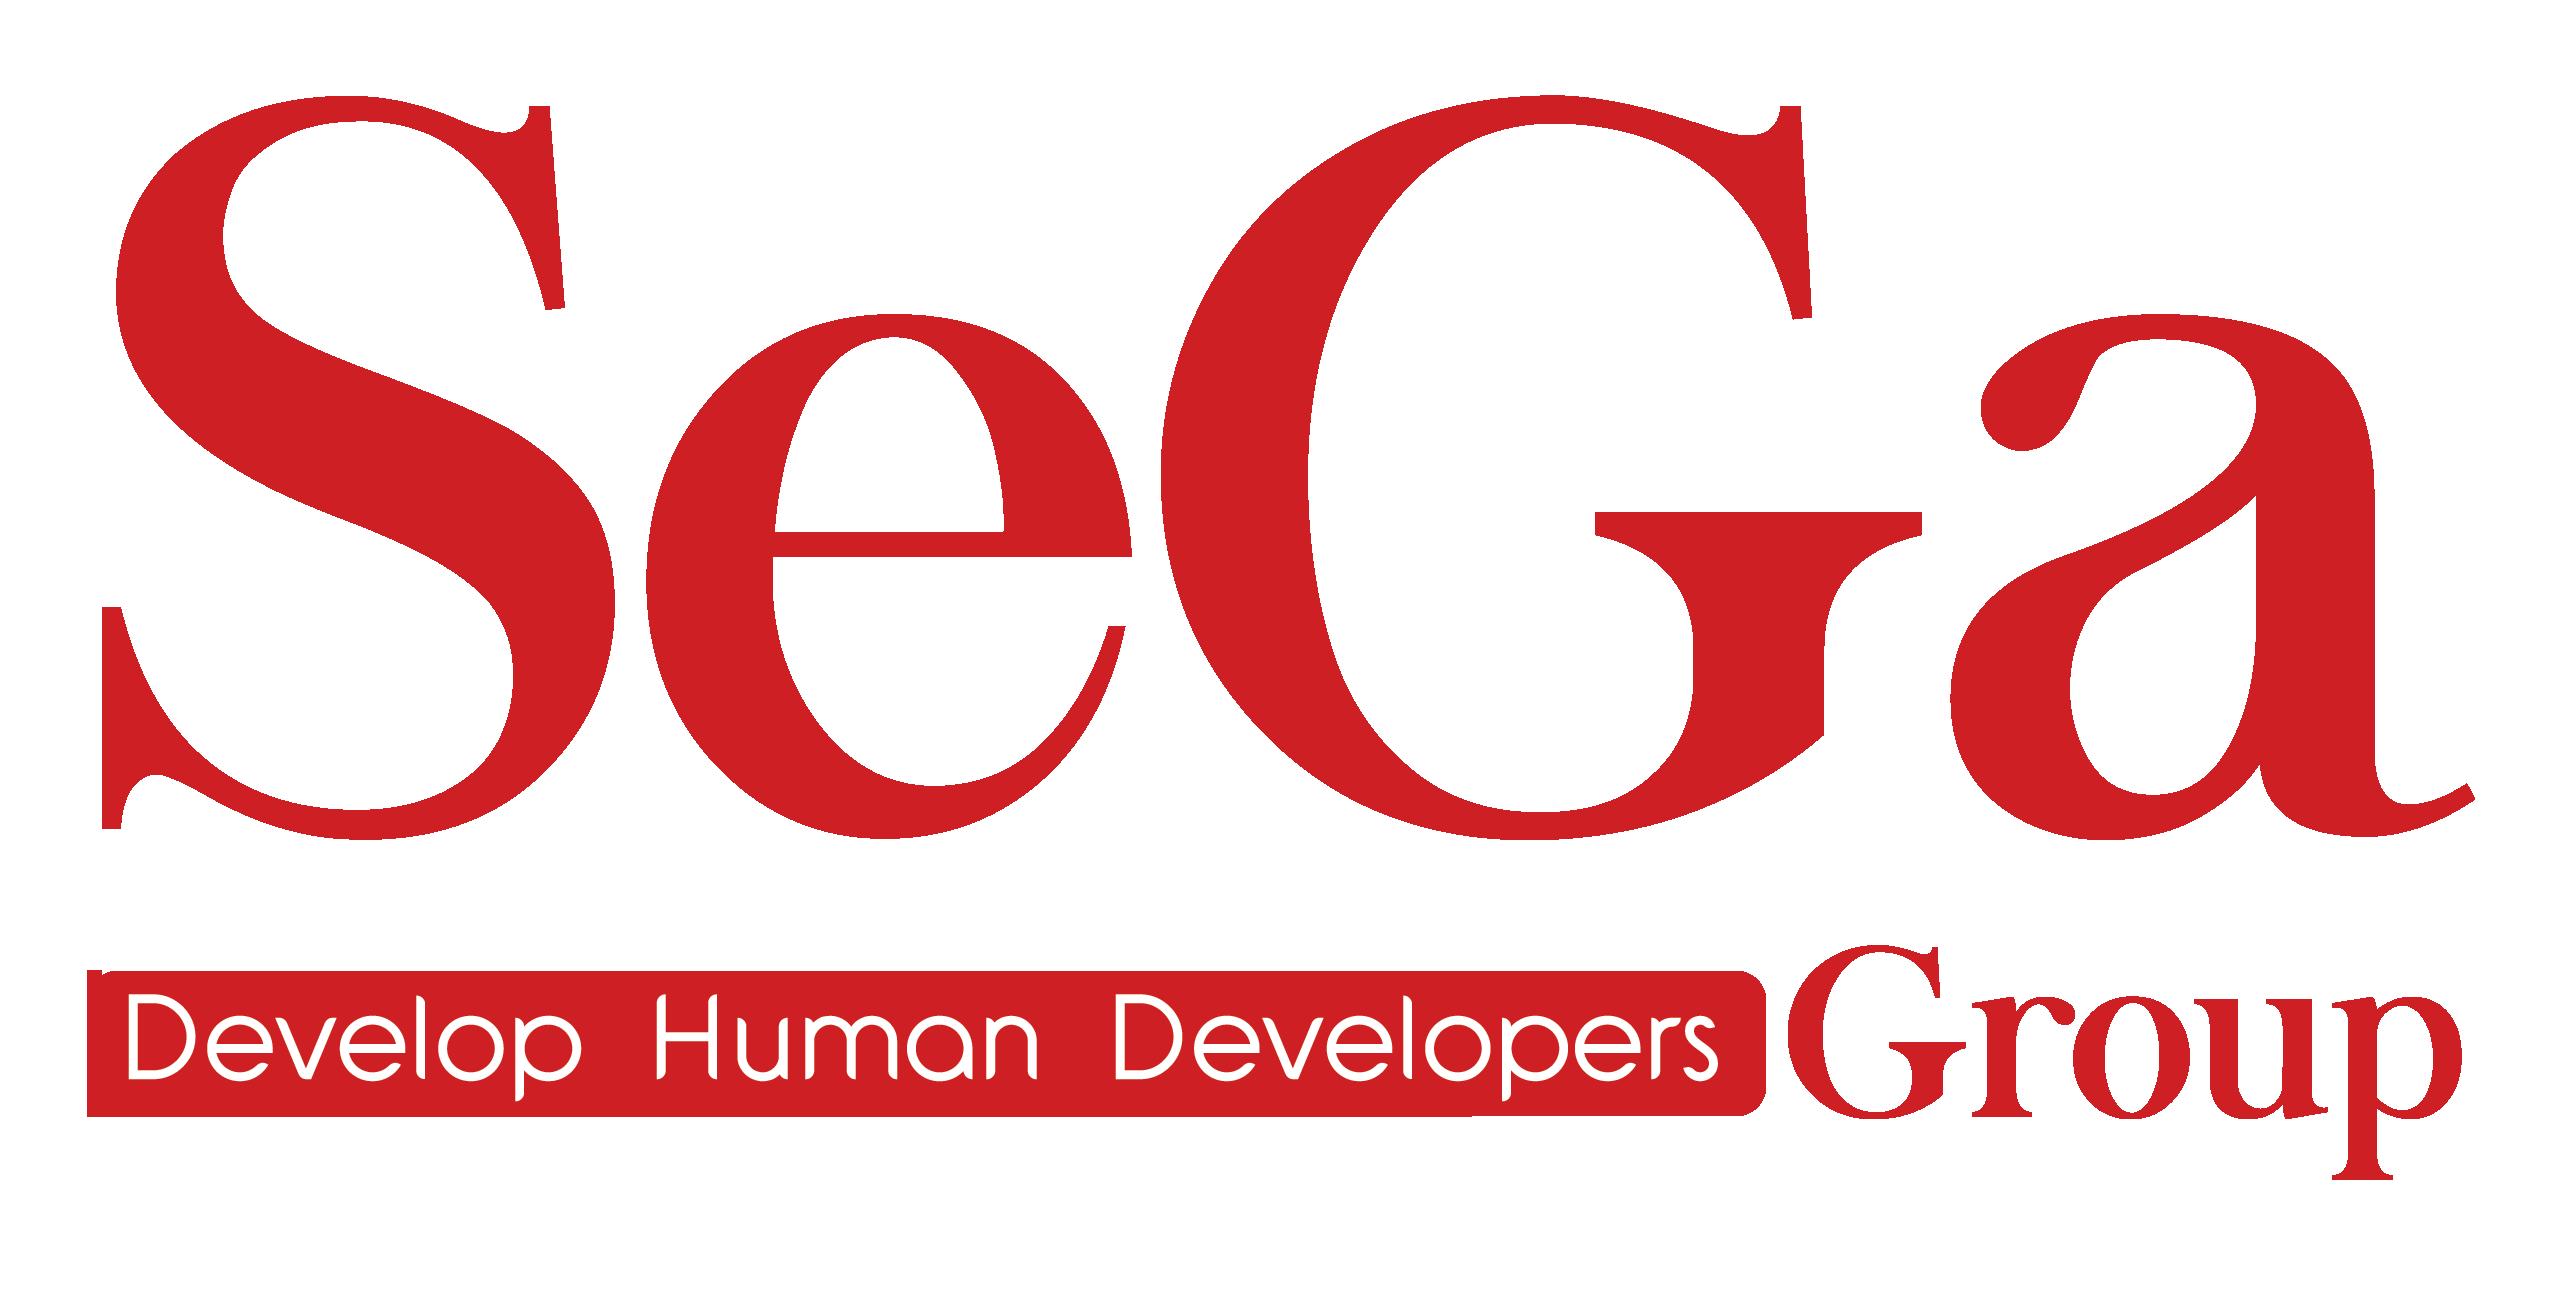 SeGa Group